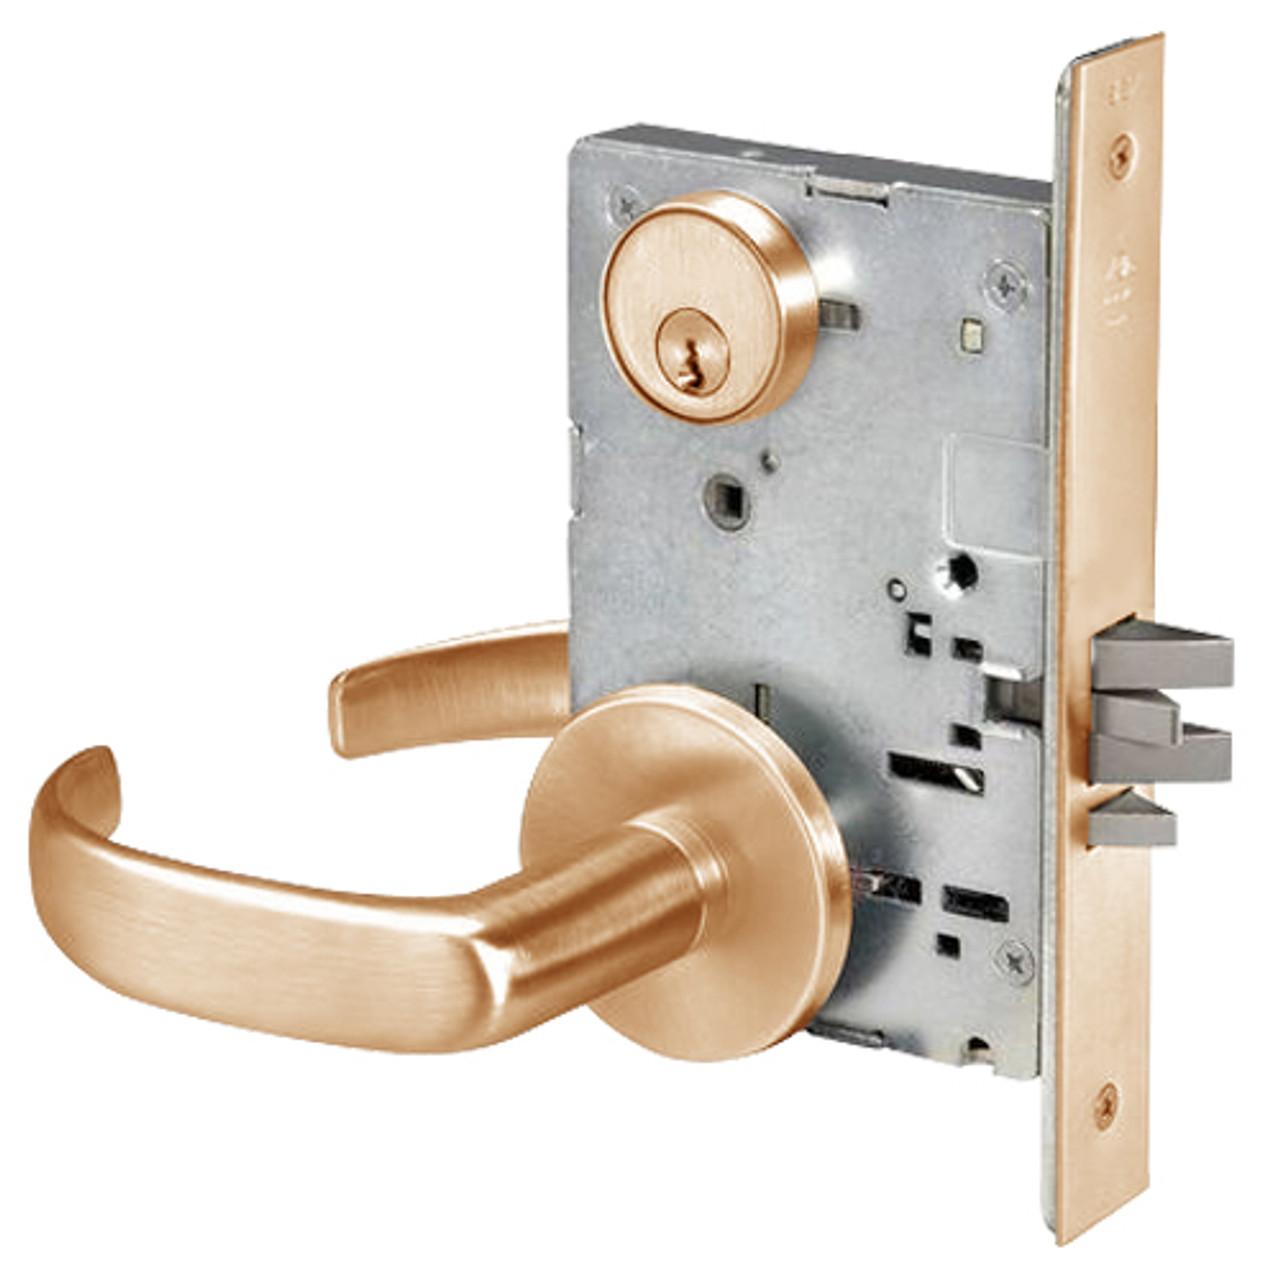 medium resolution of pbr8809fl 612 yale 8800fl series single cylinder mortise classroom w thumbturn locks with pacific beach lever in satin bronze lock depot inc